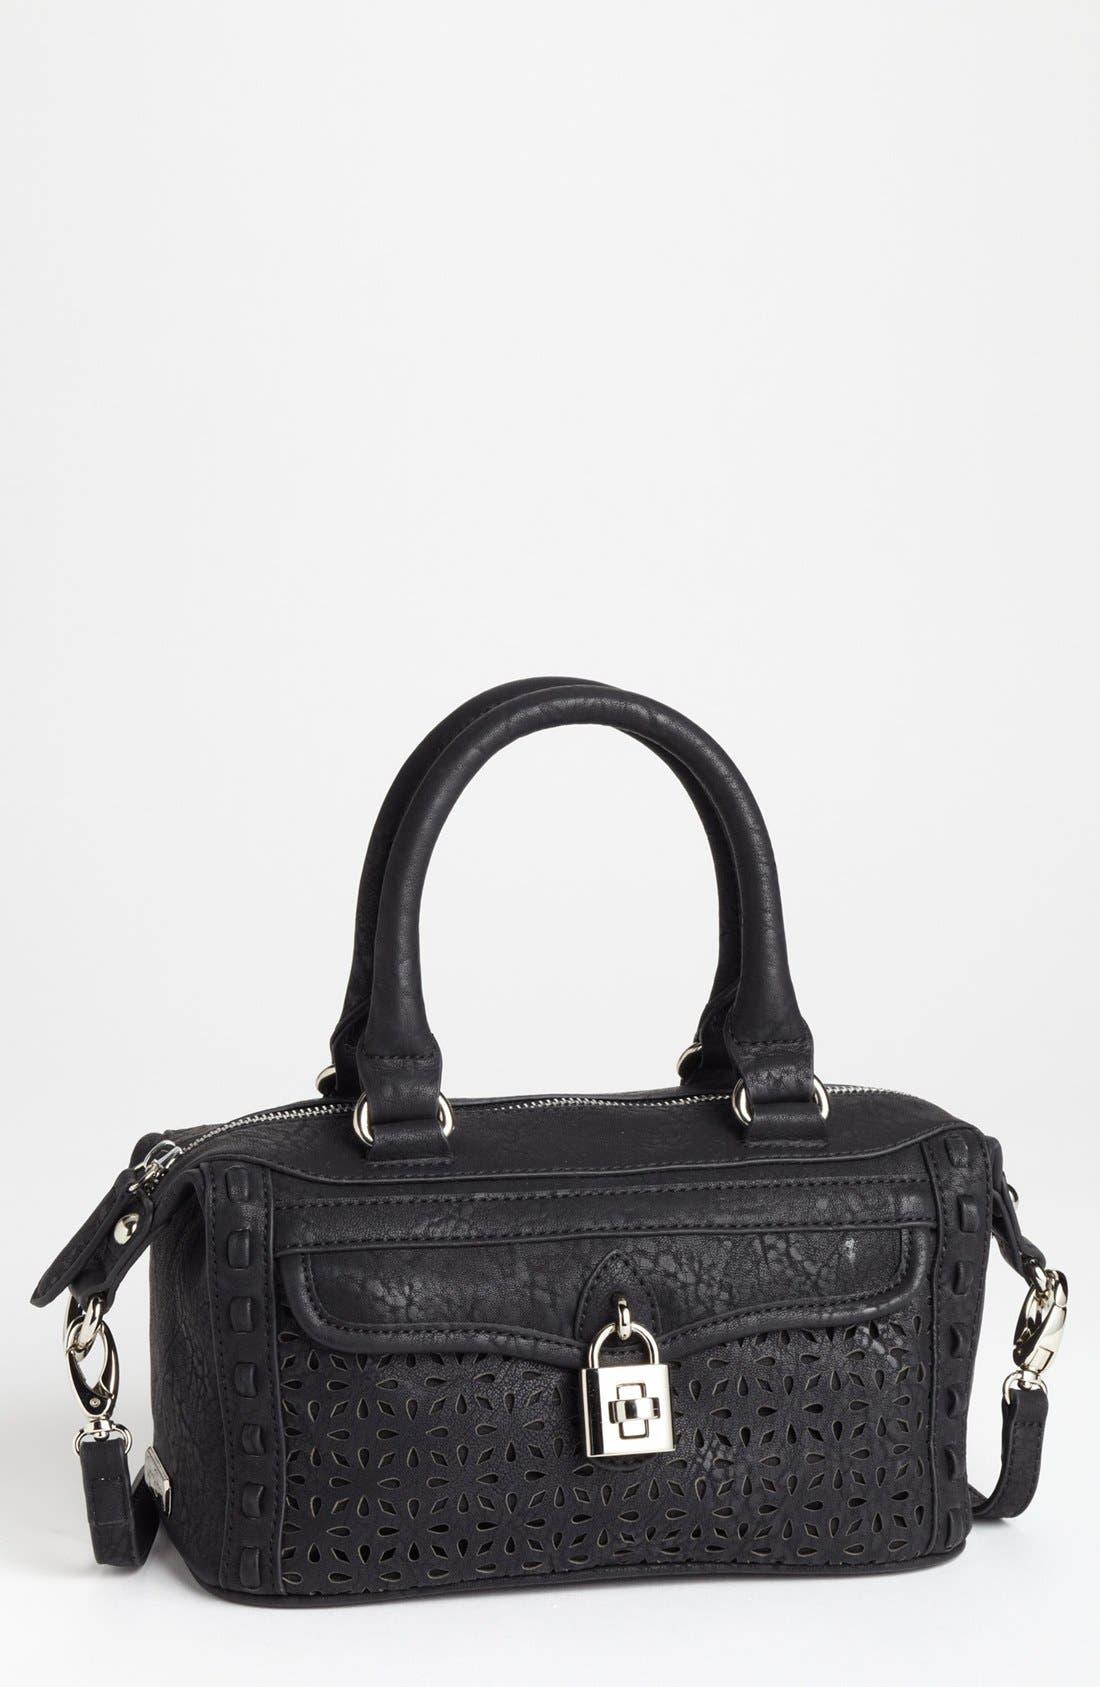 Alternate Image 1 Selected - Jessica Simpson 'Madison - Mini' Faux Leather Satchel